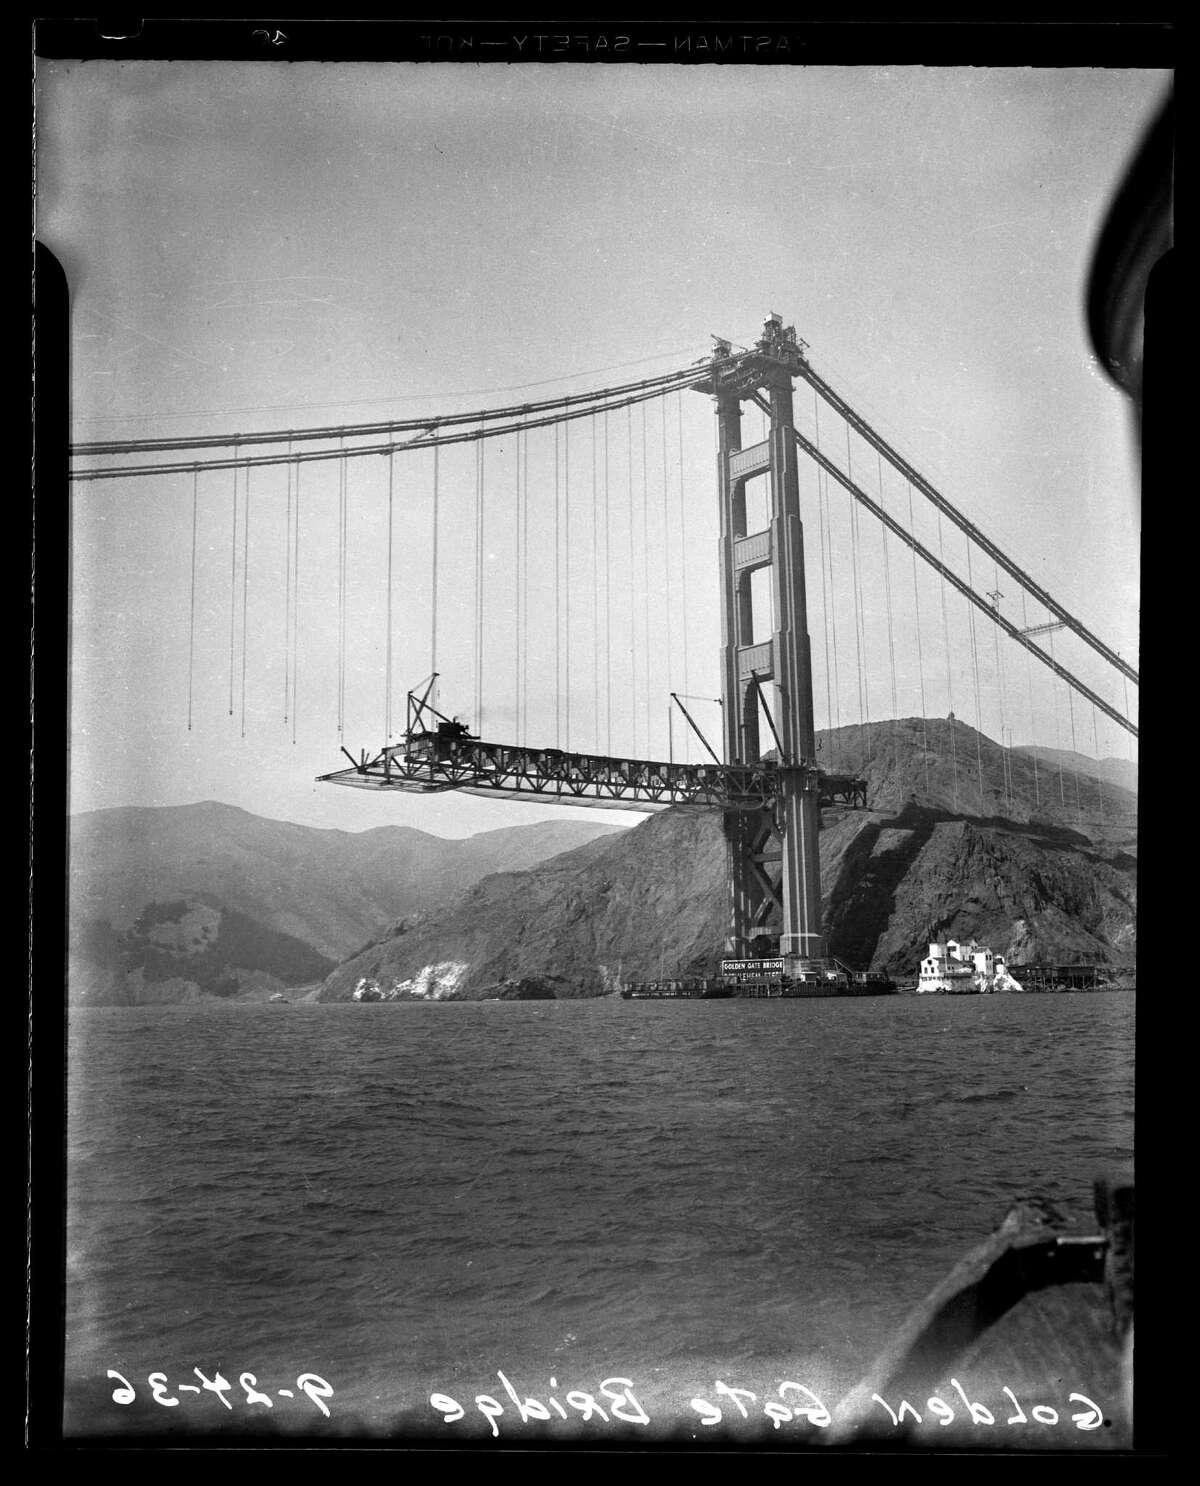 The Golden Gate Bridge under construction on Sept. 24, 1936.